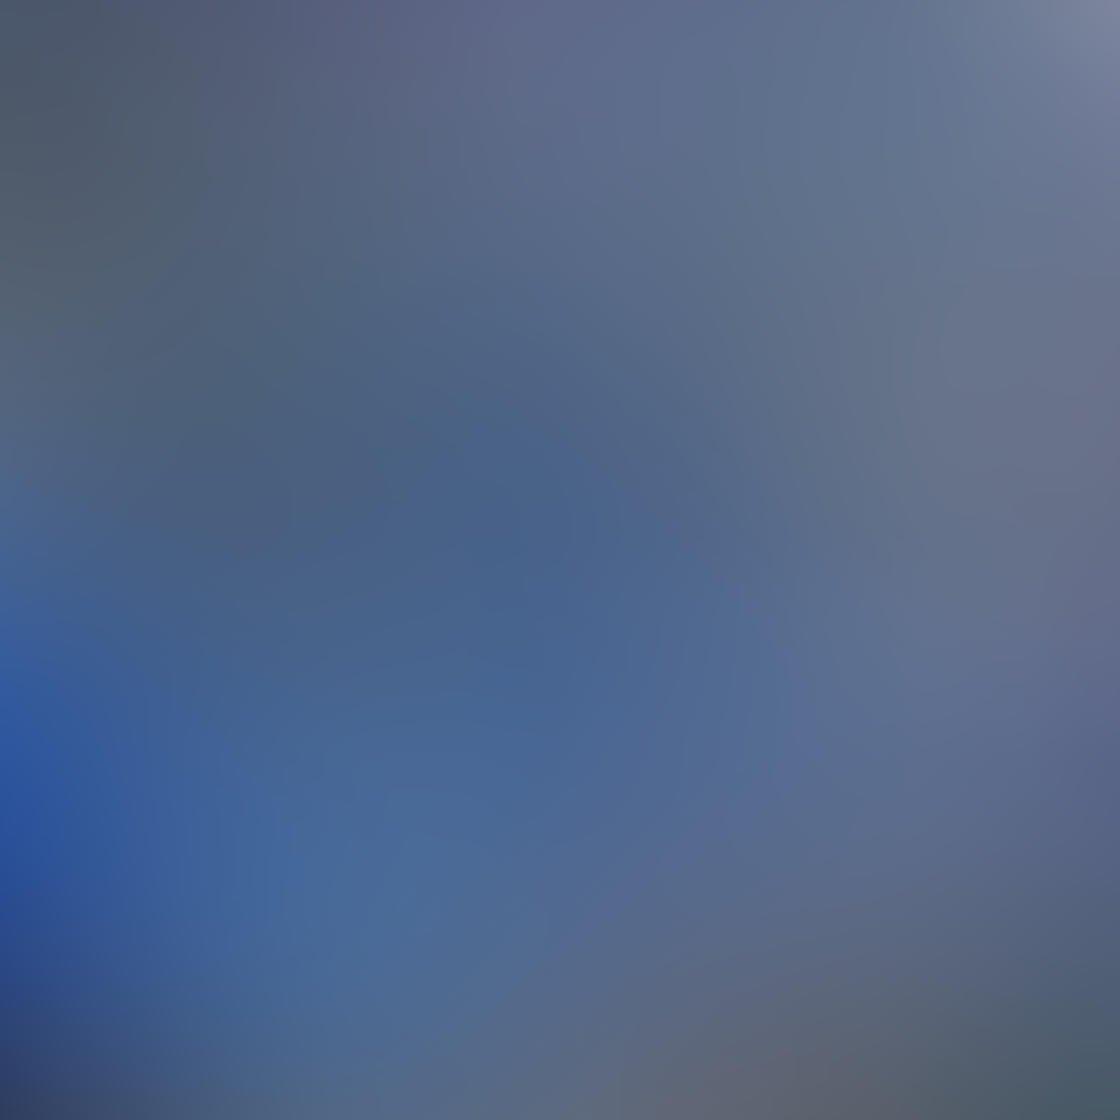 iPhone Photos Blue Color 15